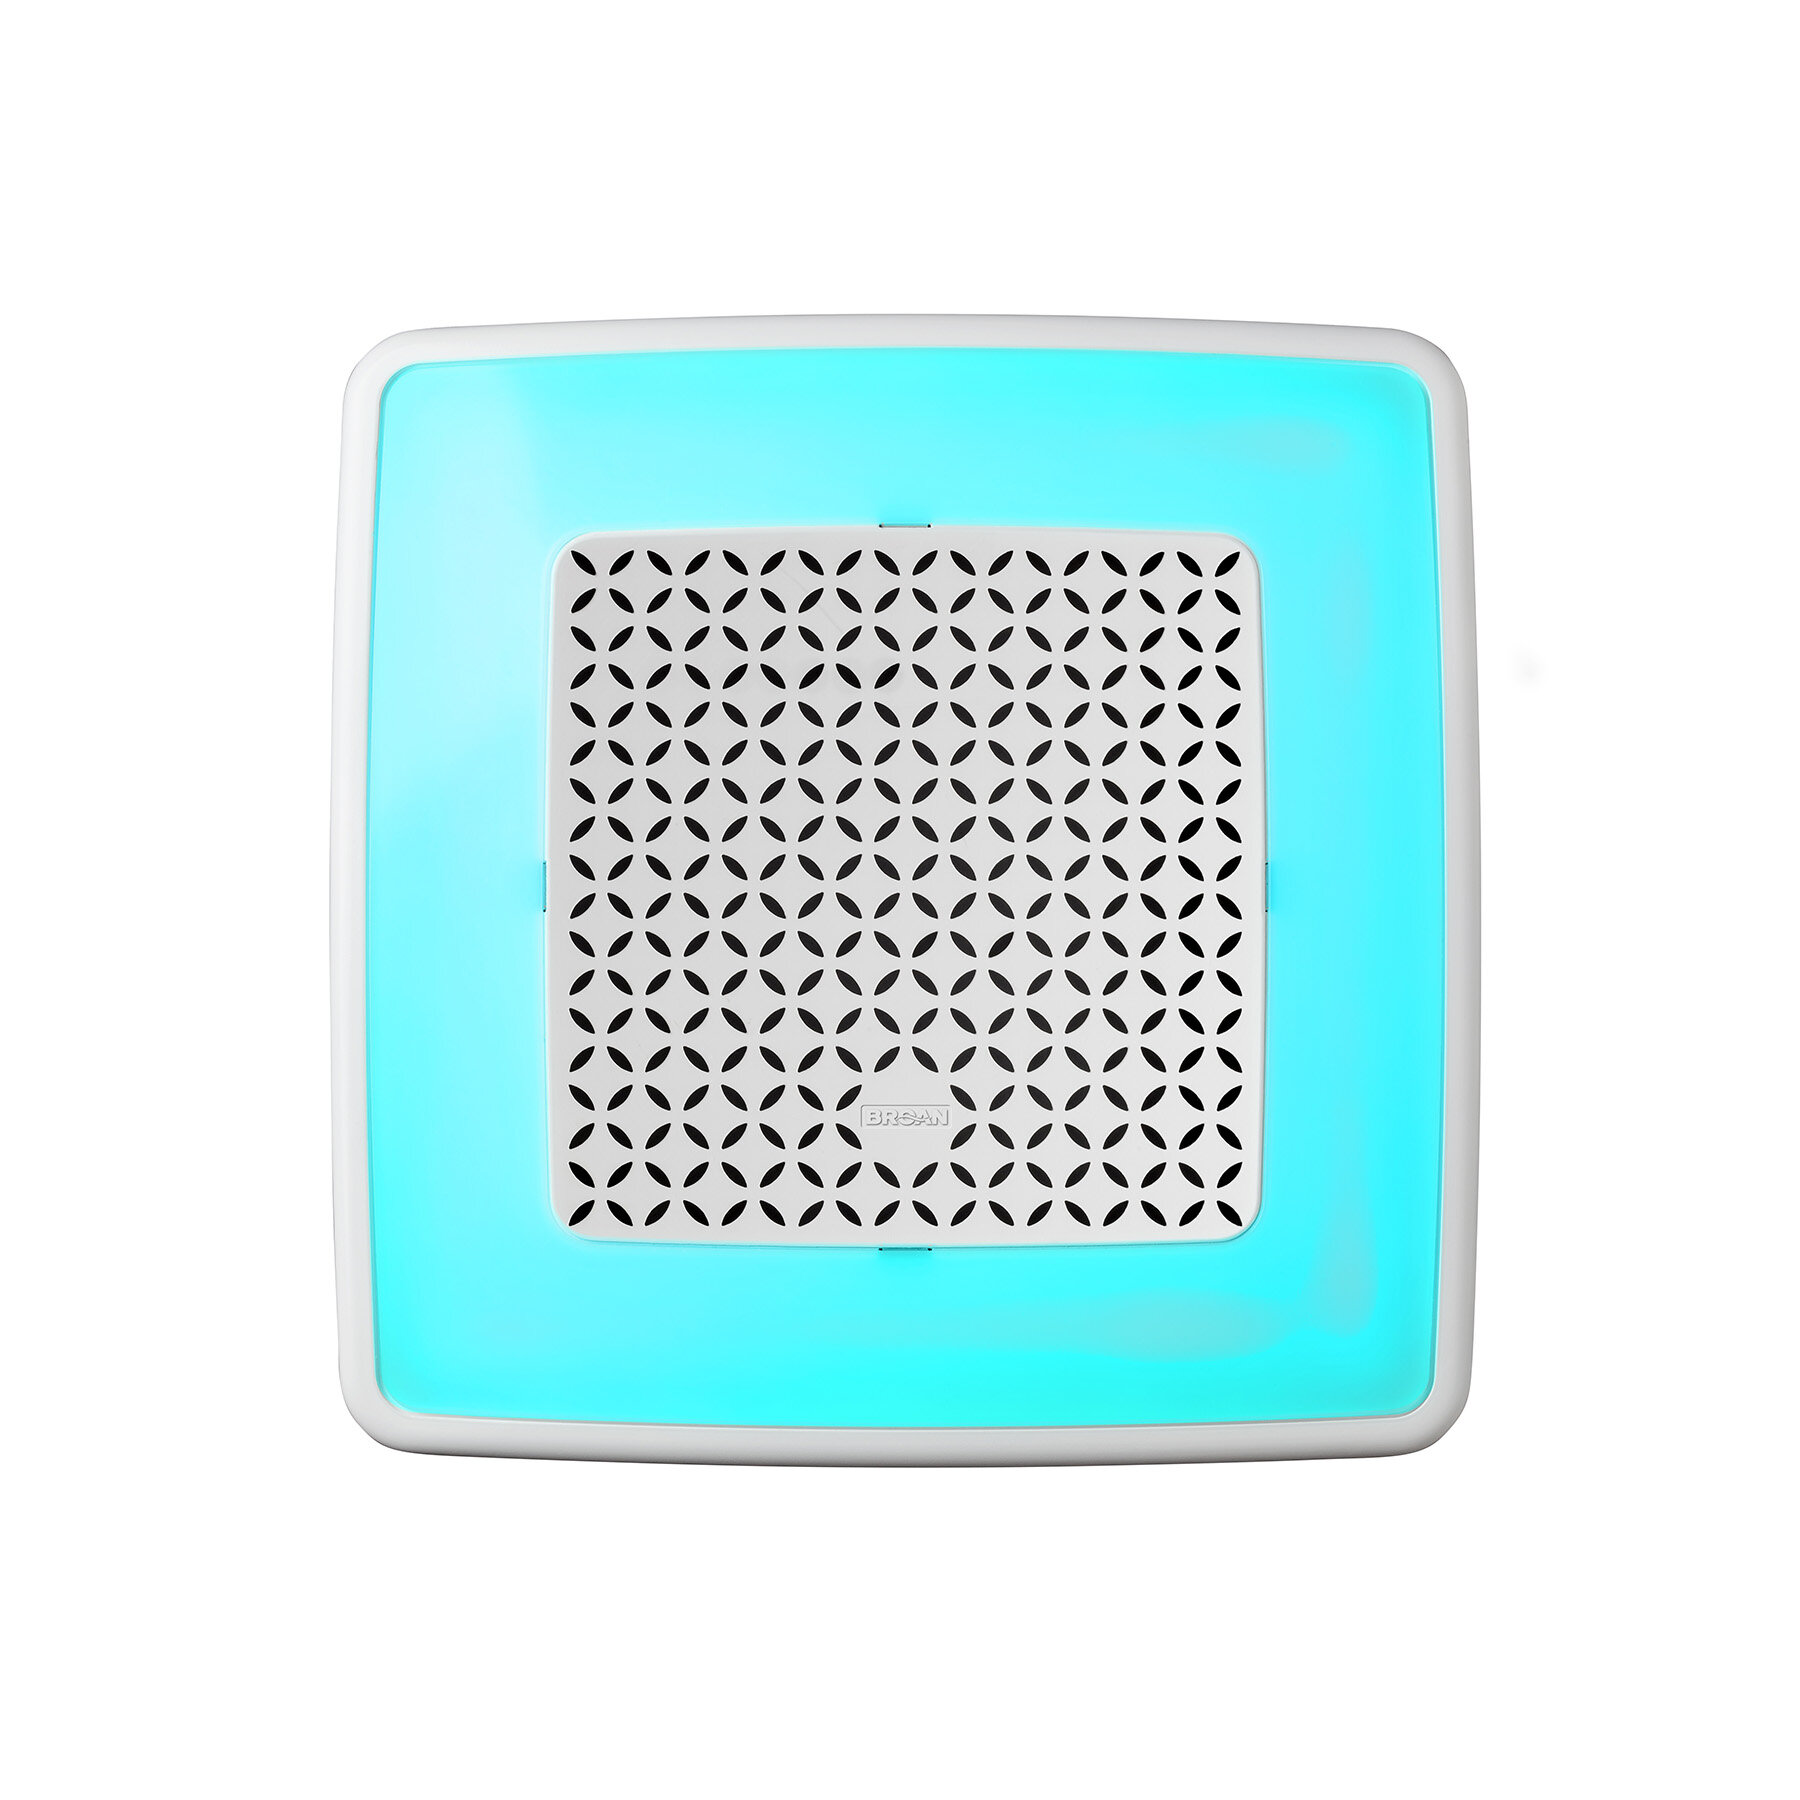 Broan Chroma Comfort 110 Cfm Energy Star Bathroom Fan With Multi Color Light Reviews Wayfair